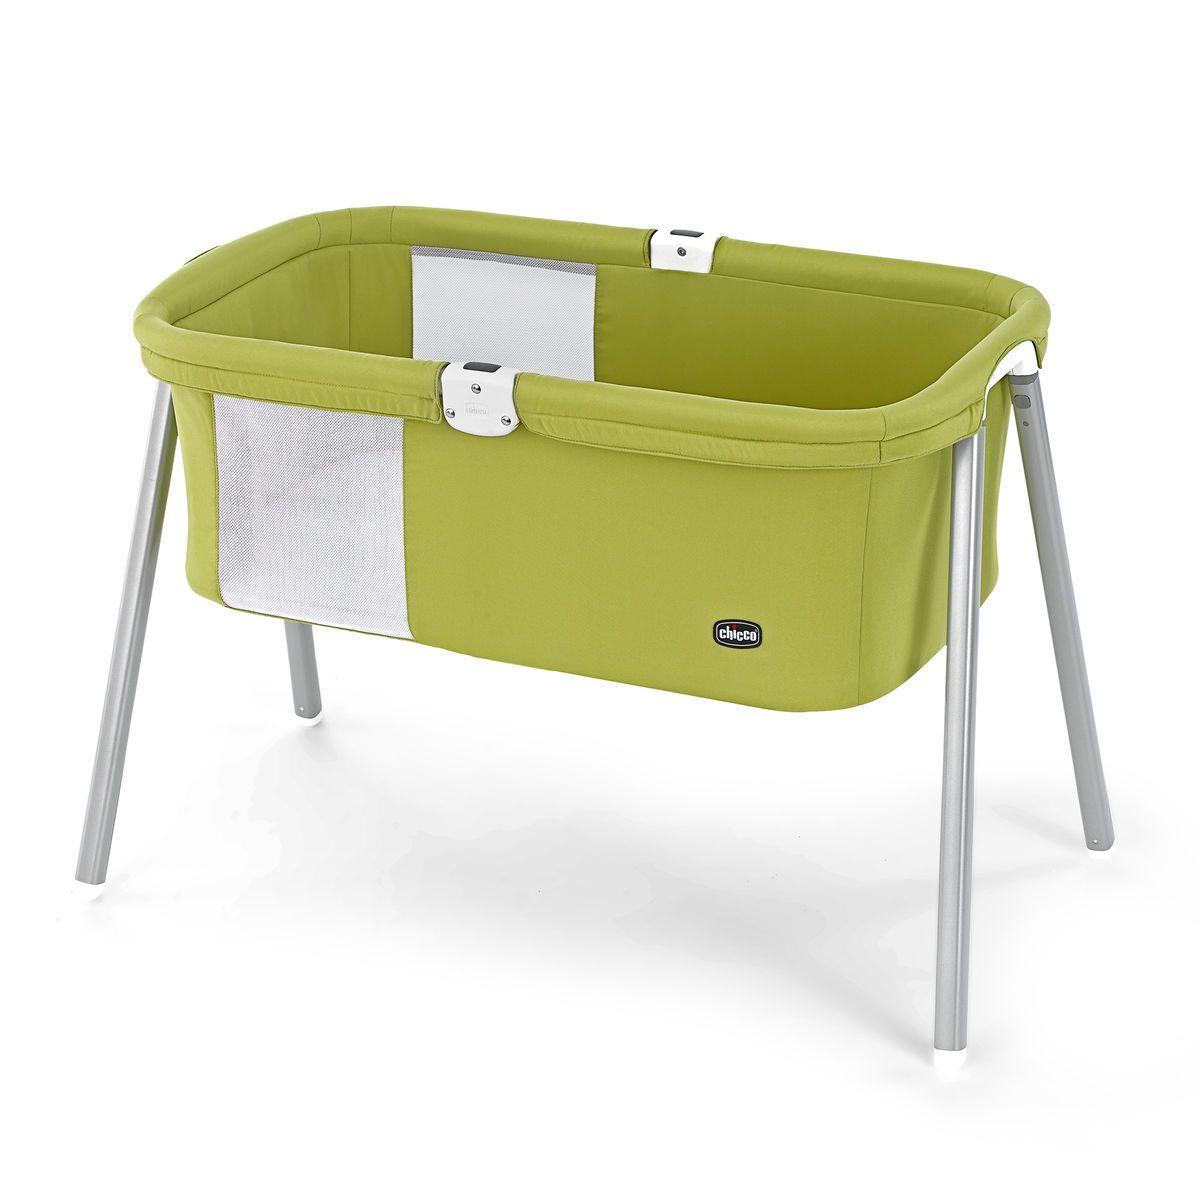 Co Sleeper for Baby Easy Folding Portable Crib KoolaBaby Baby Bassinet Bedside Sleeper Grey